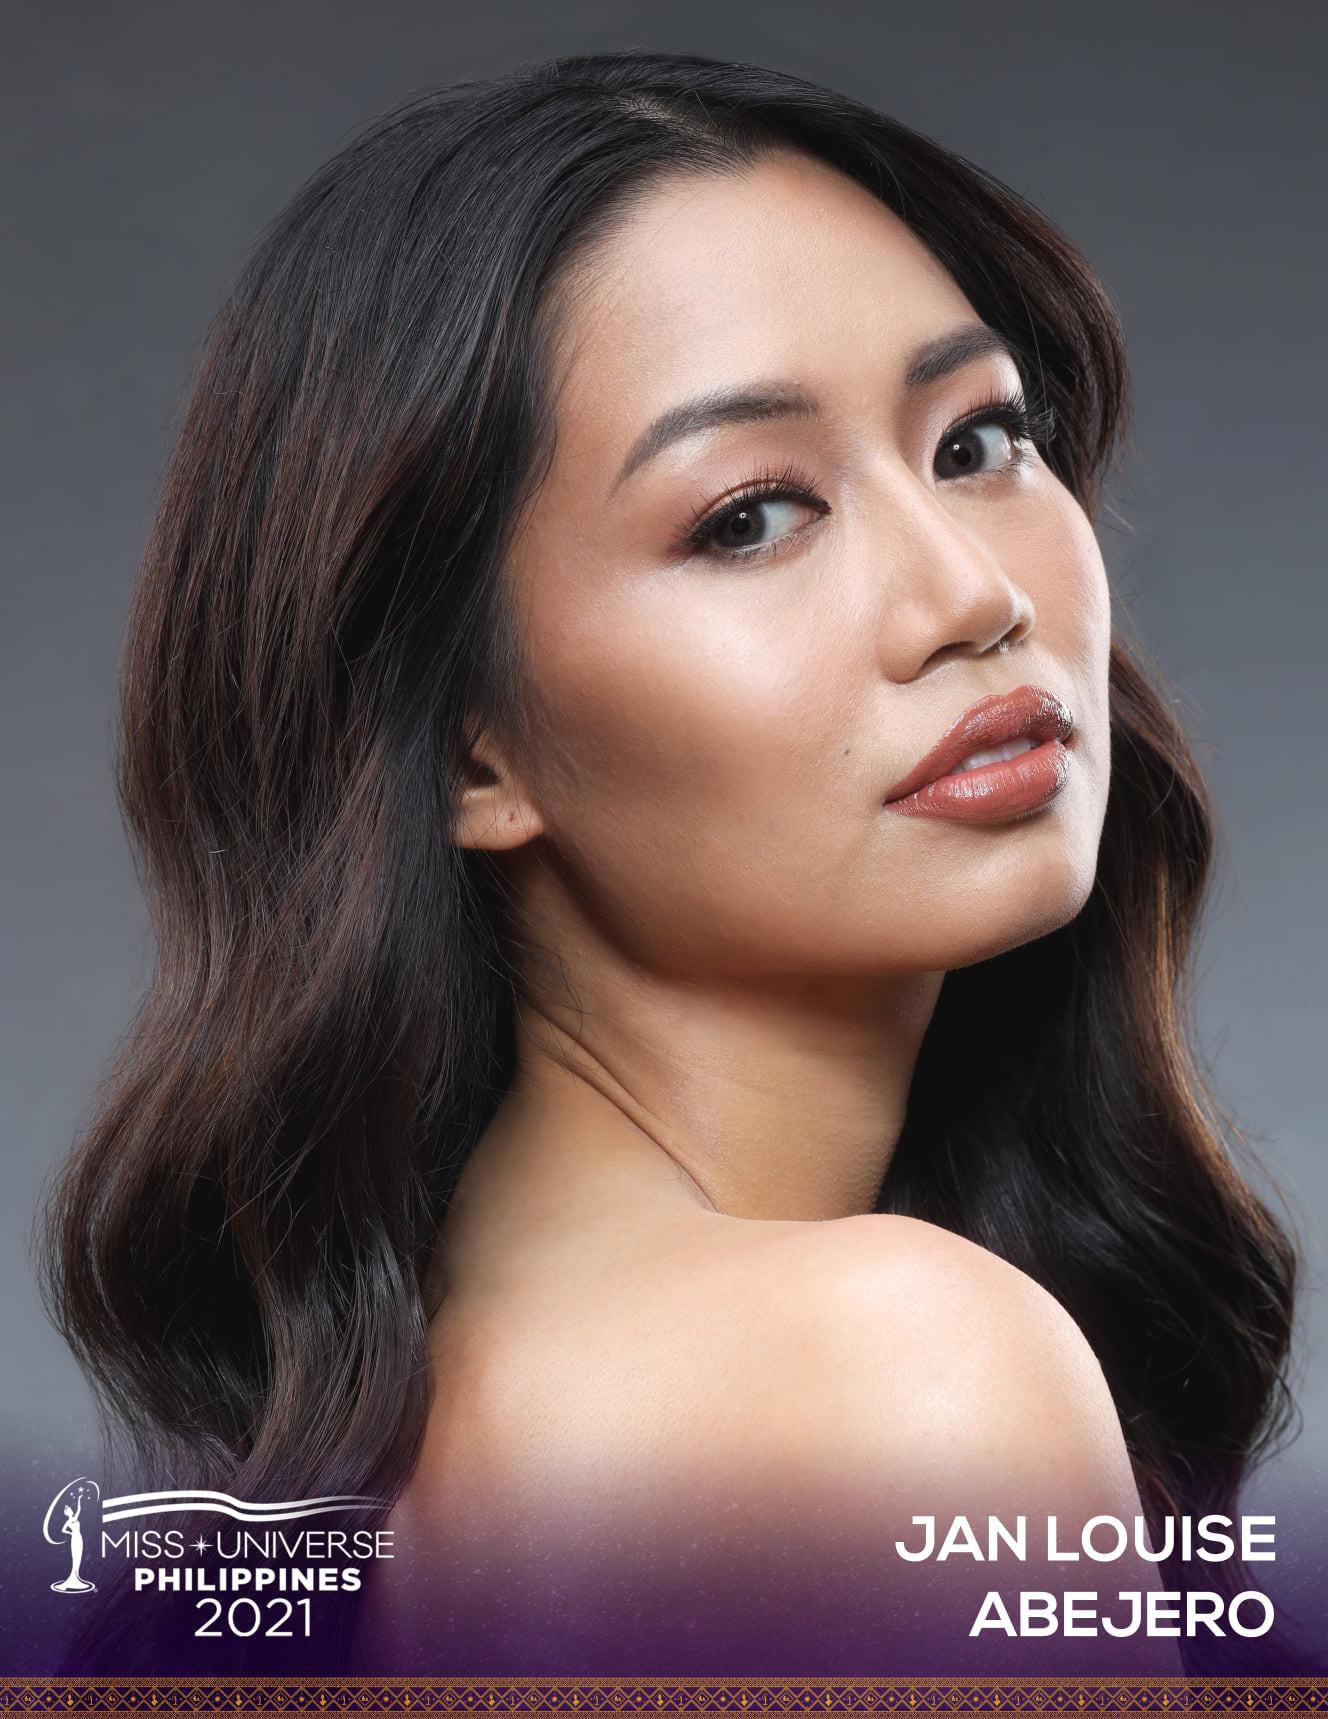 pre-candidatas a miss universe philippines 2021. - Página 3 AlB4mF